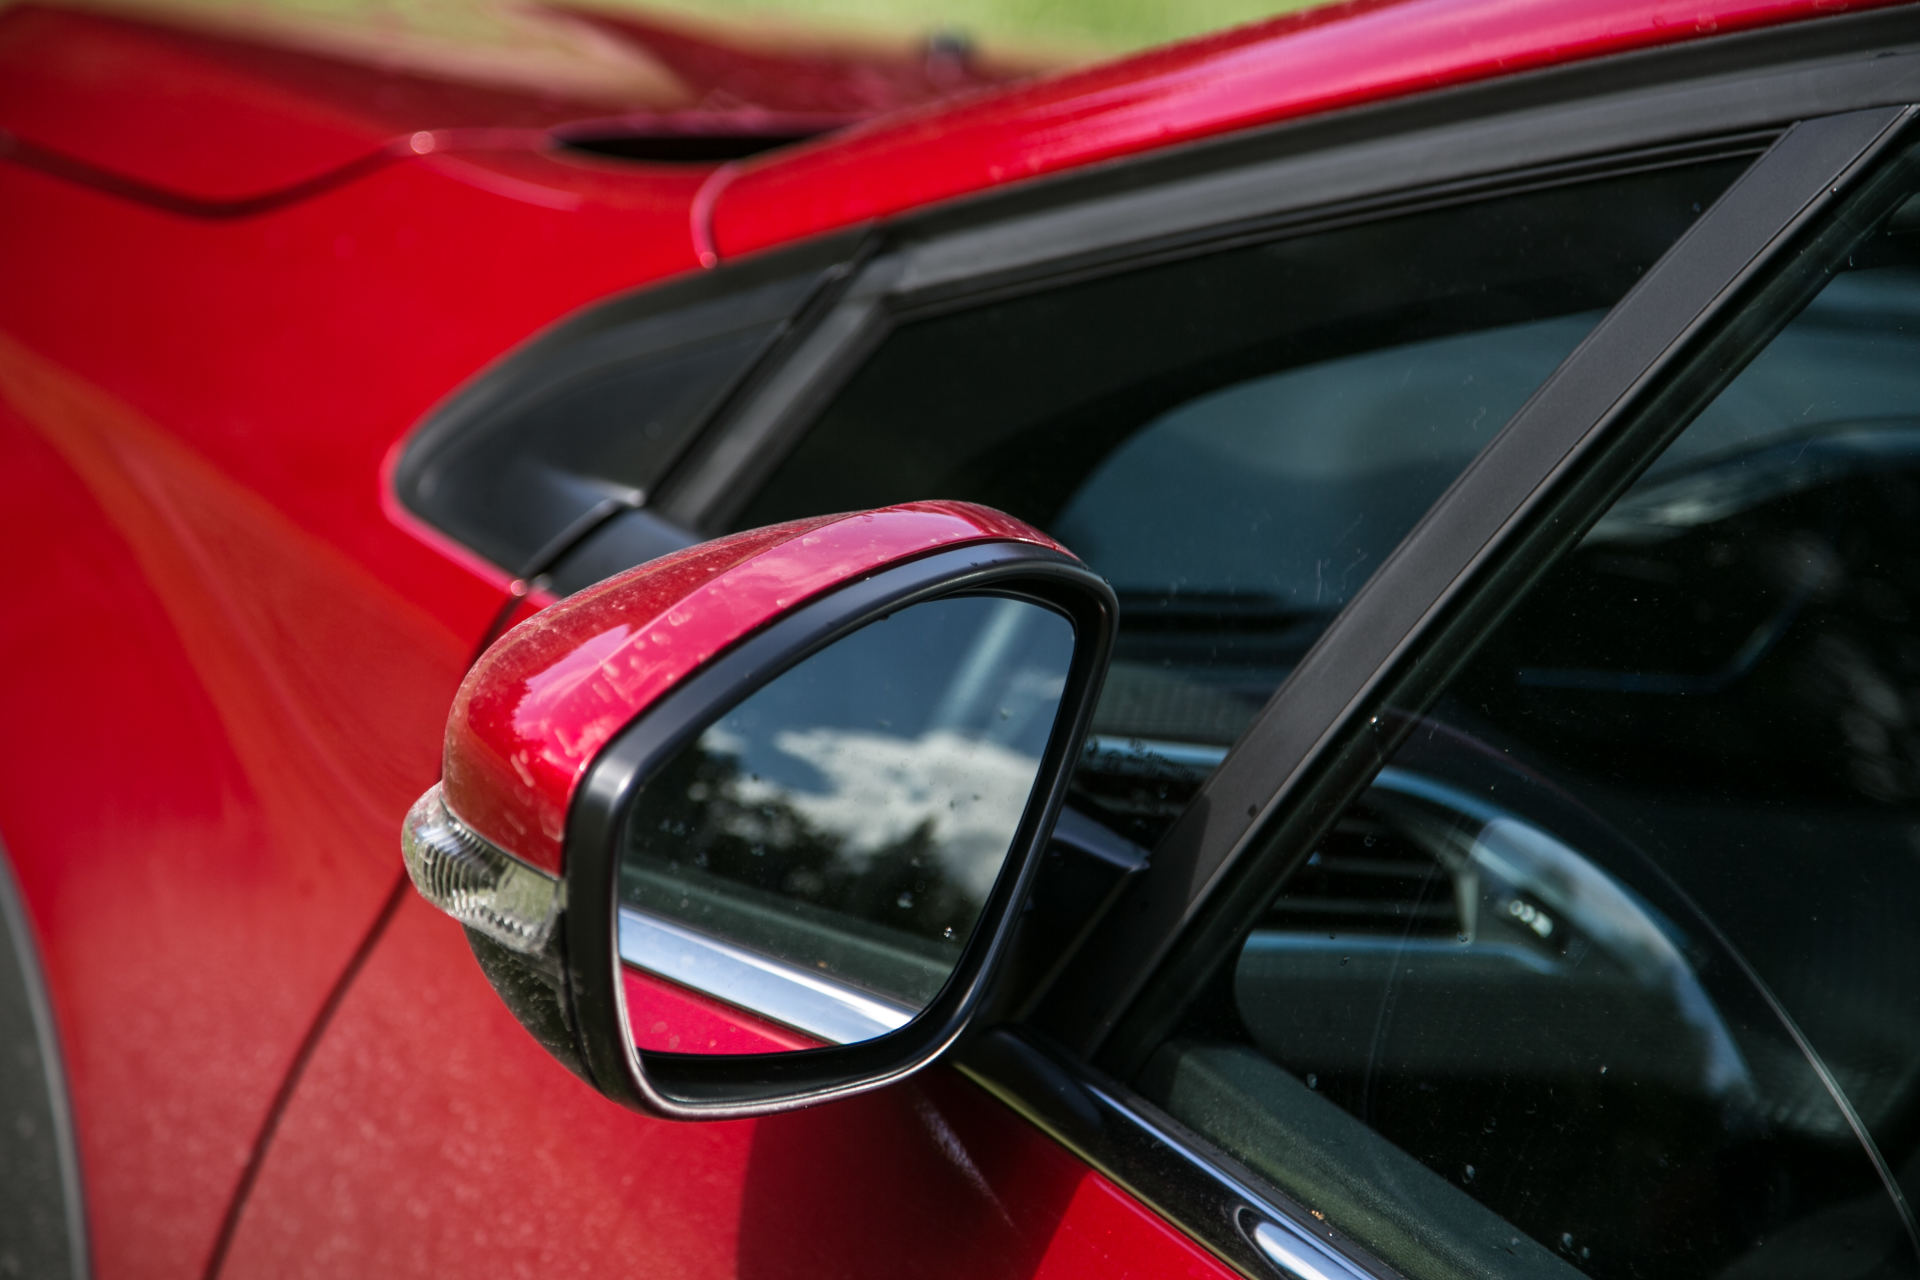 Automobiliu veidrodeliai vilniuje